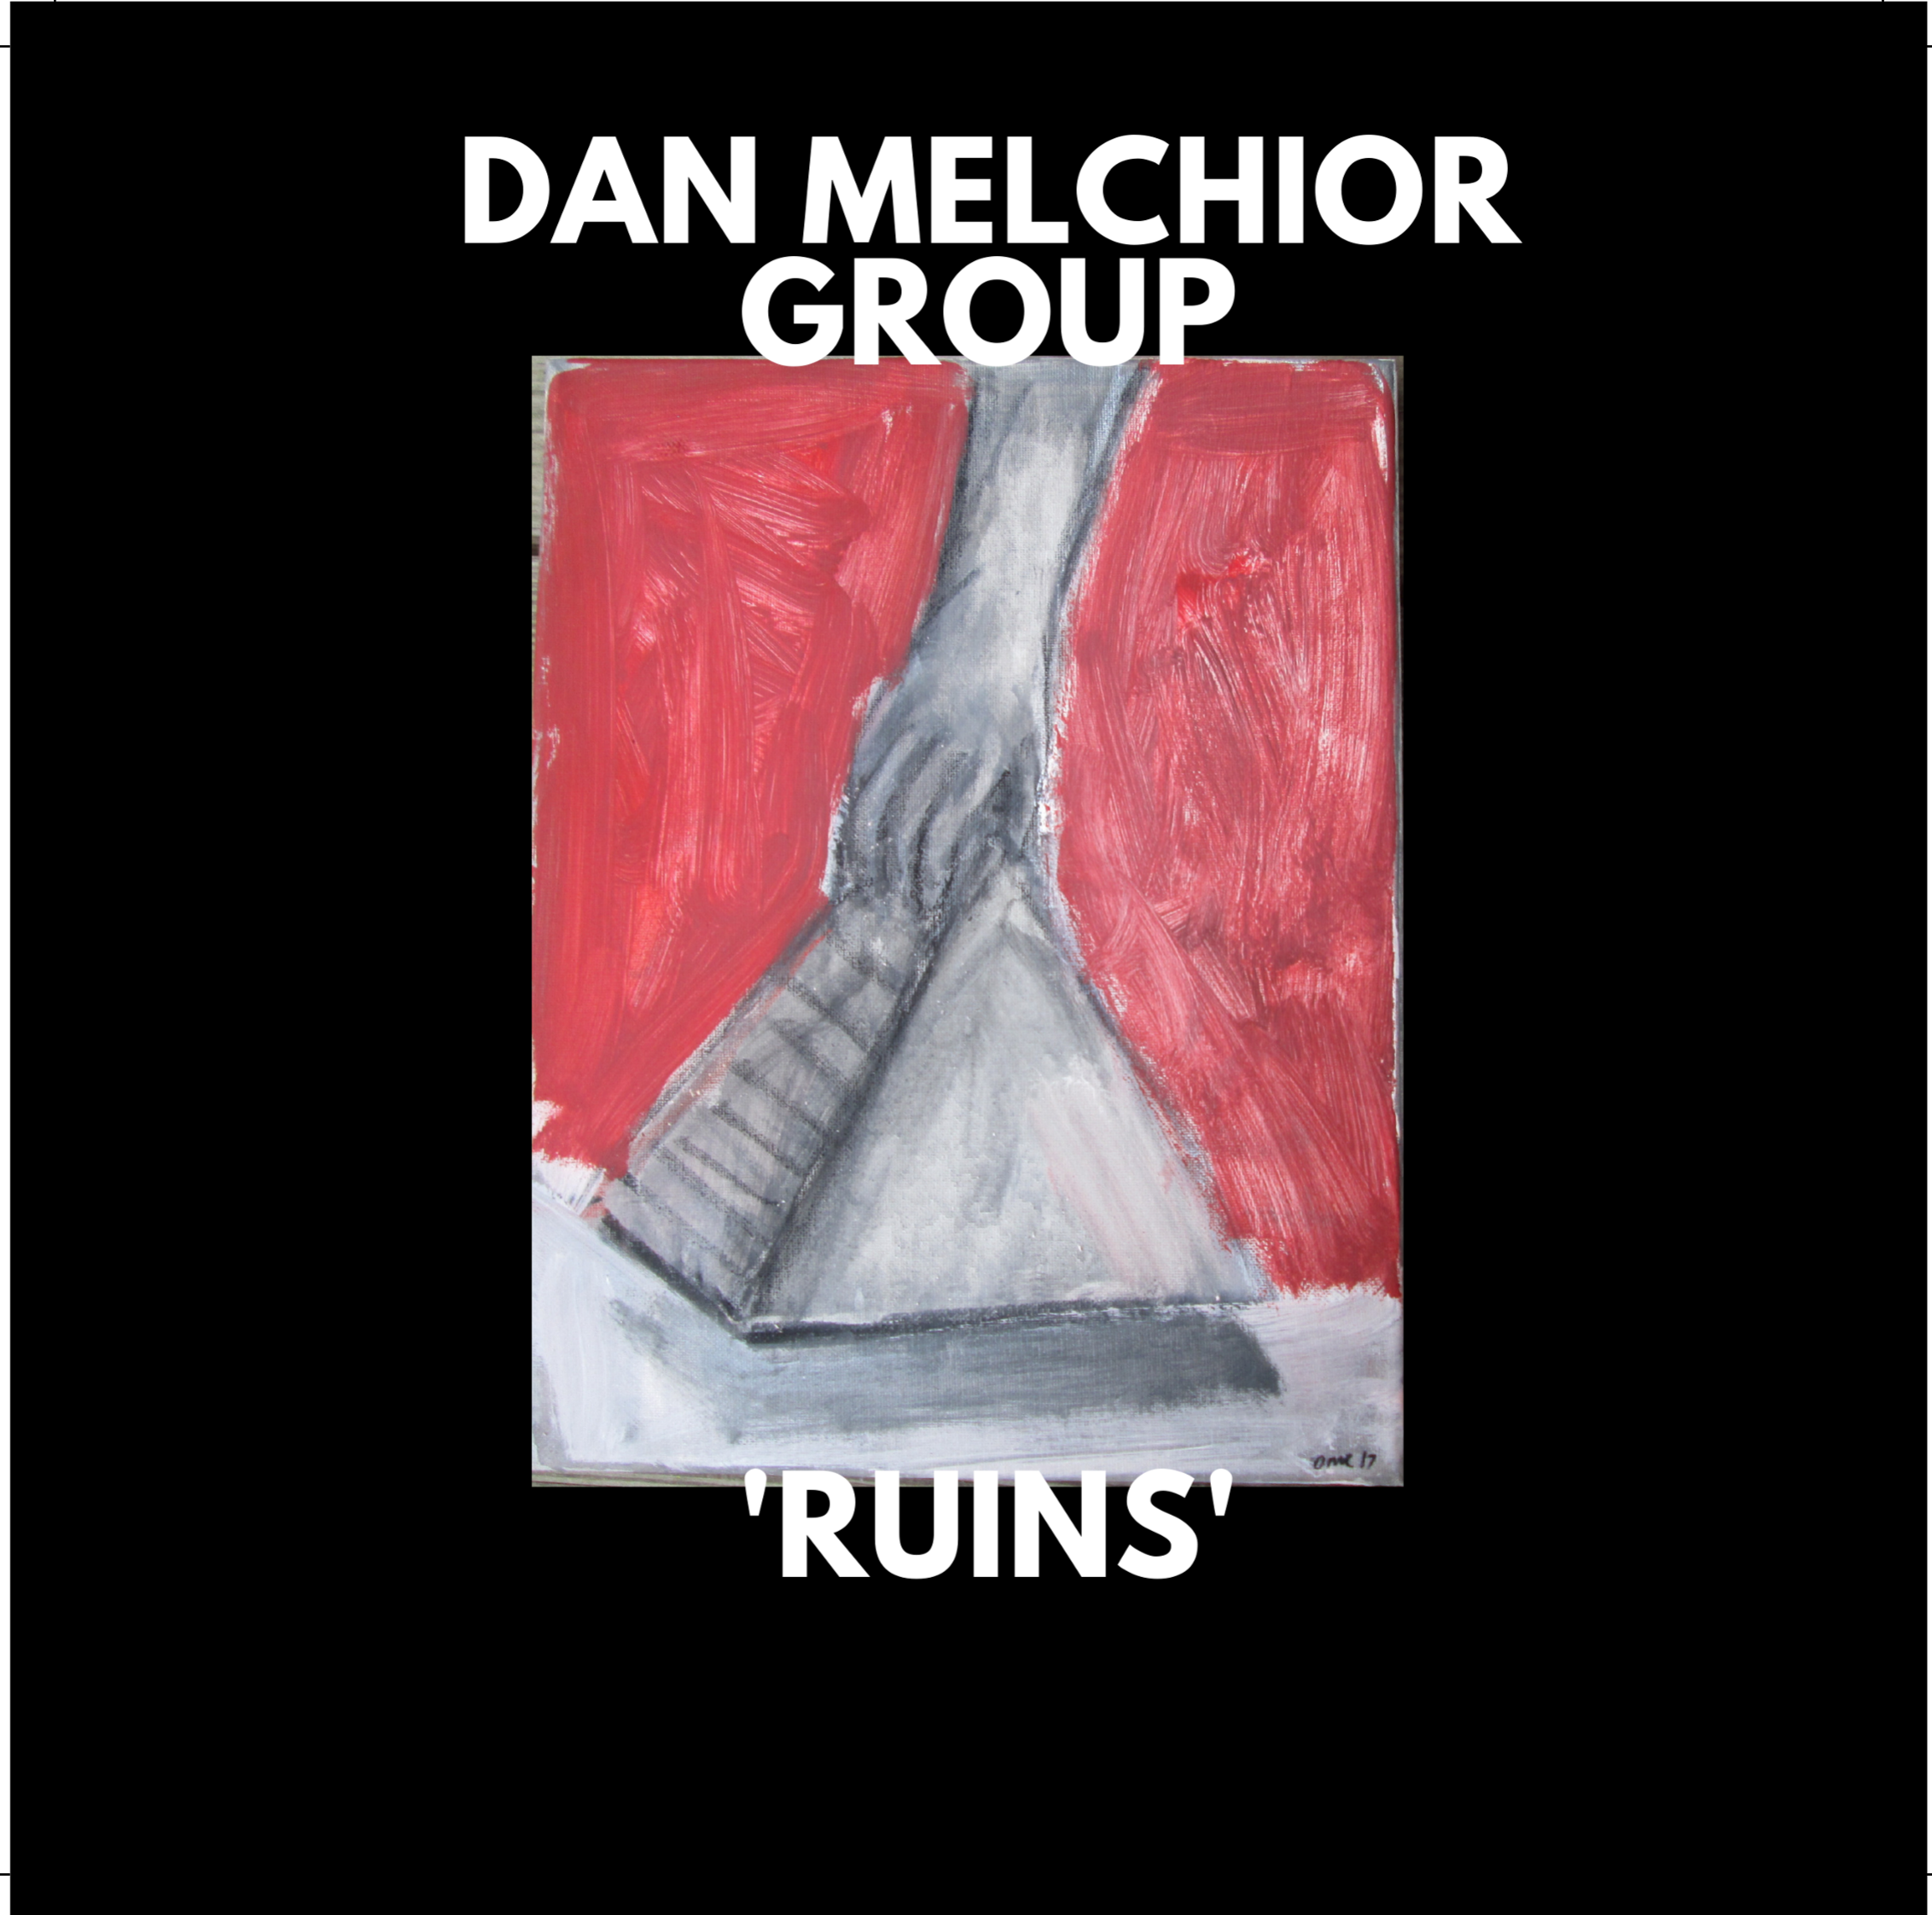 Dan Melchior Group - Ruins 2xLP - COMING SOON!